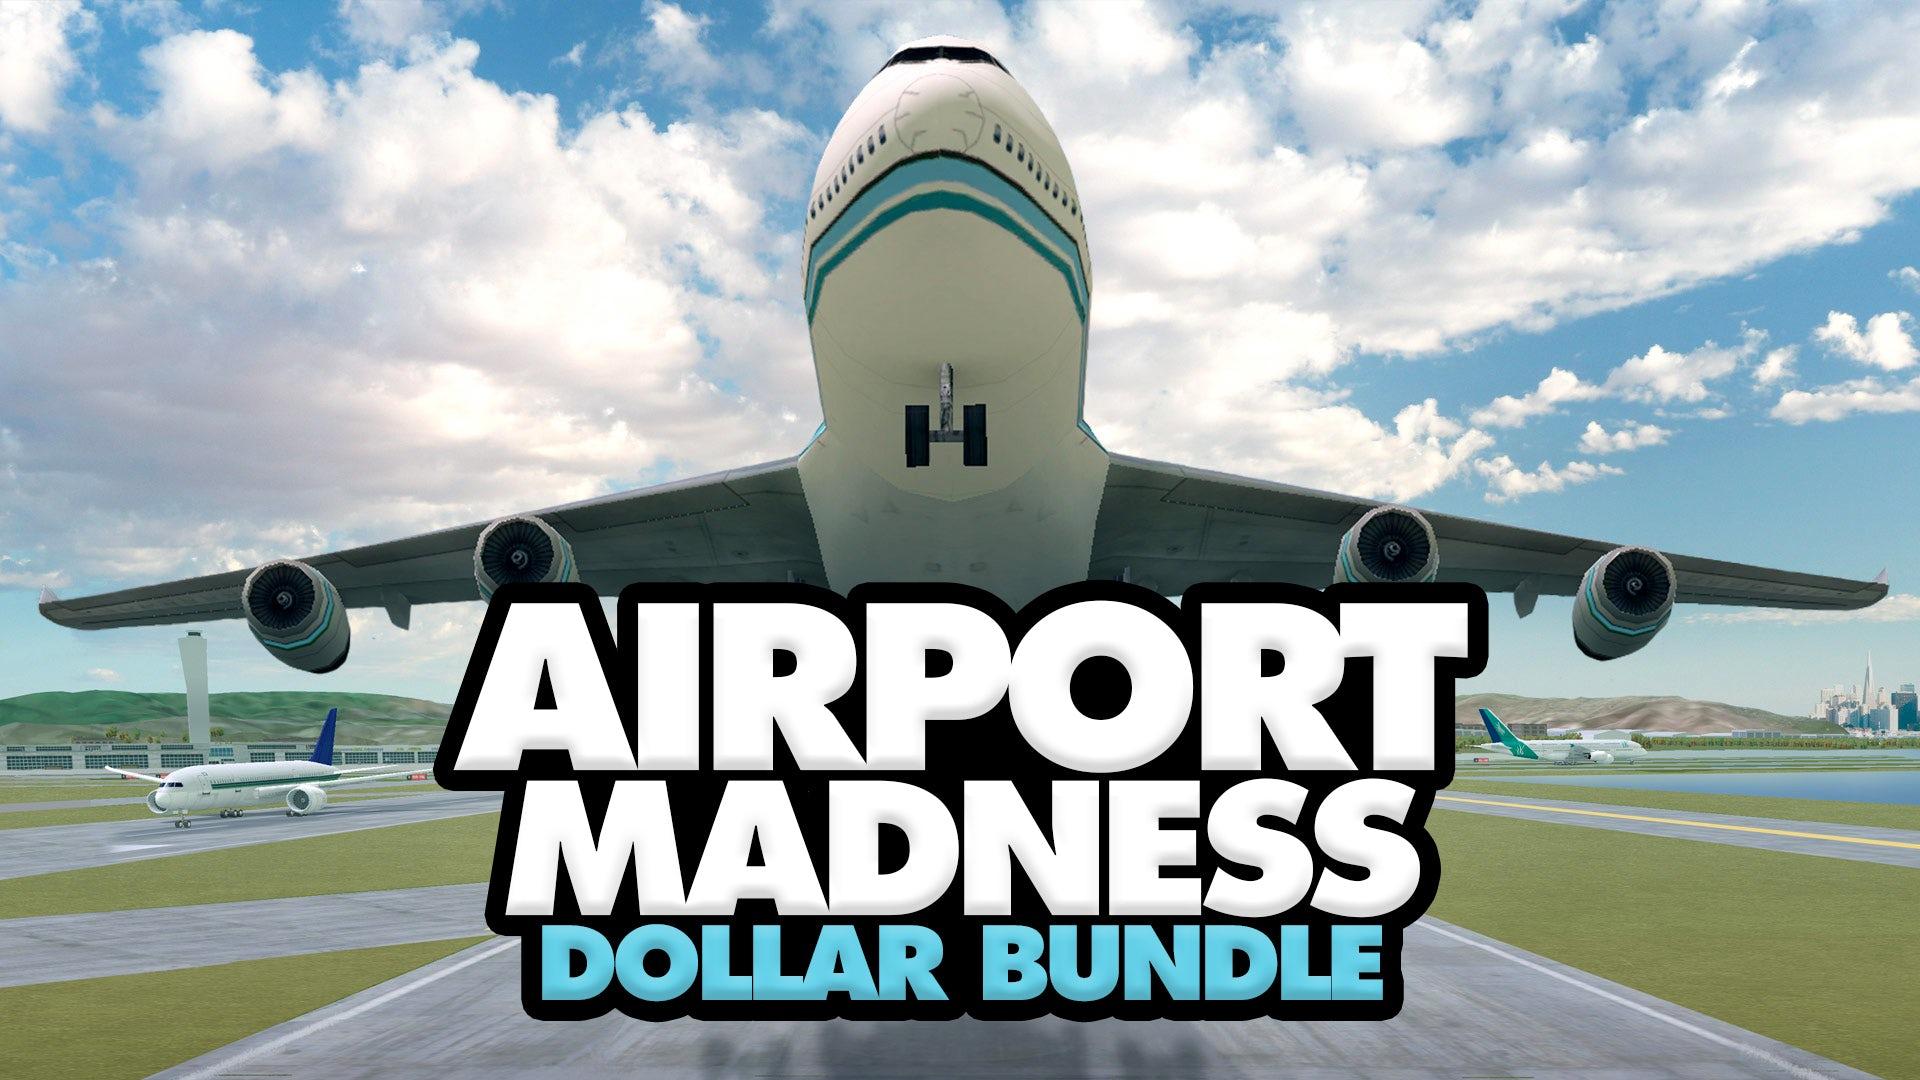 Airport Madness Dollar Bundle (Steam-Keys, Fanatical)